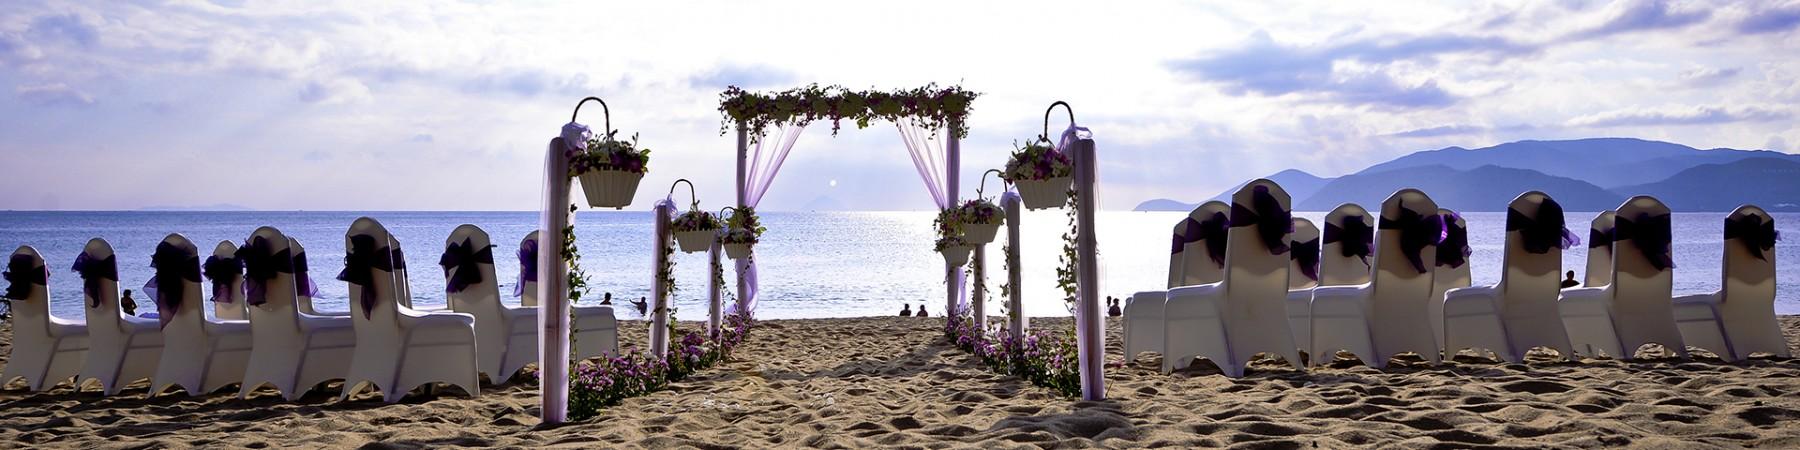 wedding-in-nha-trang